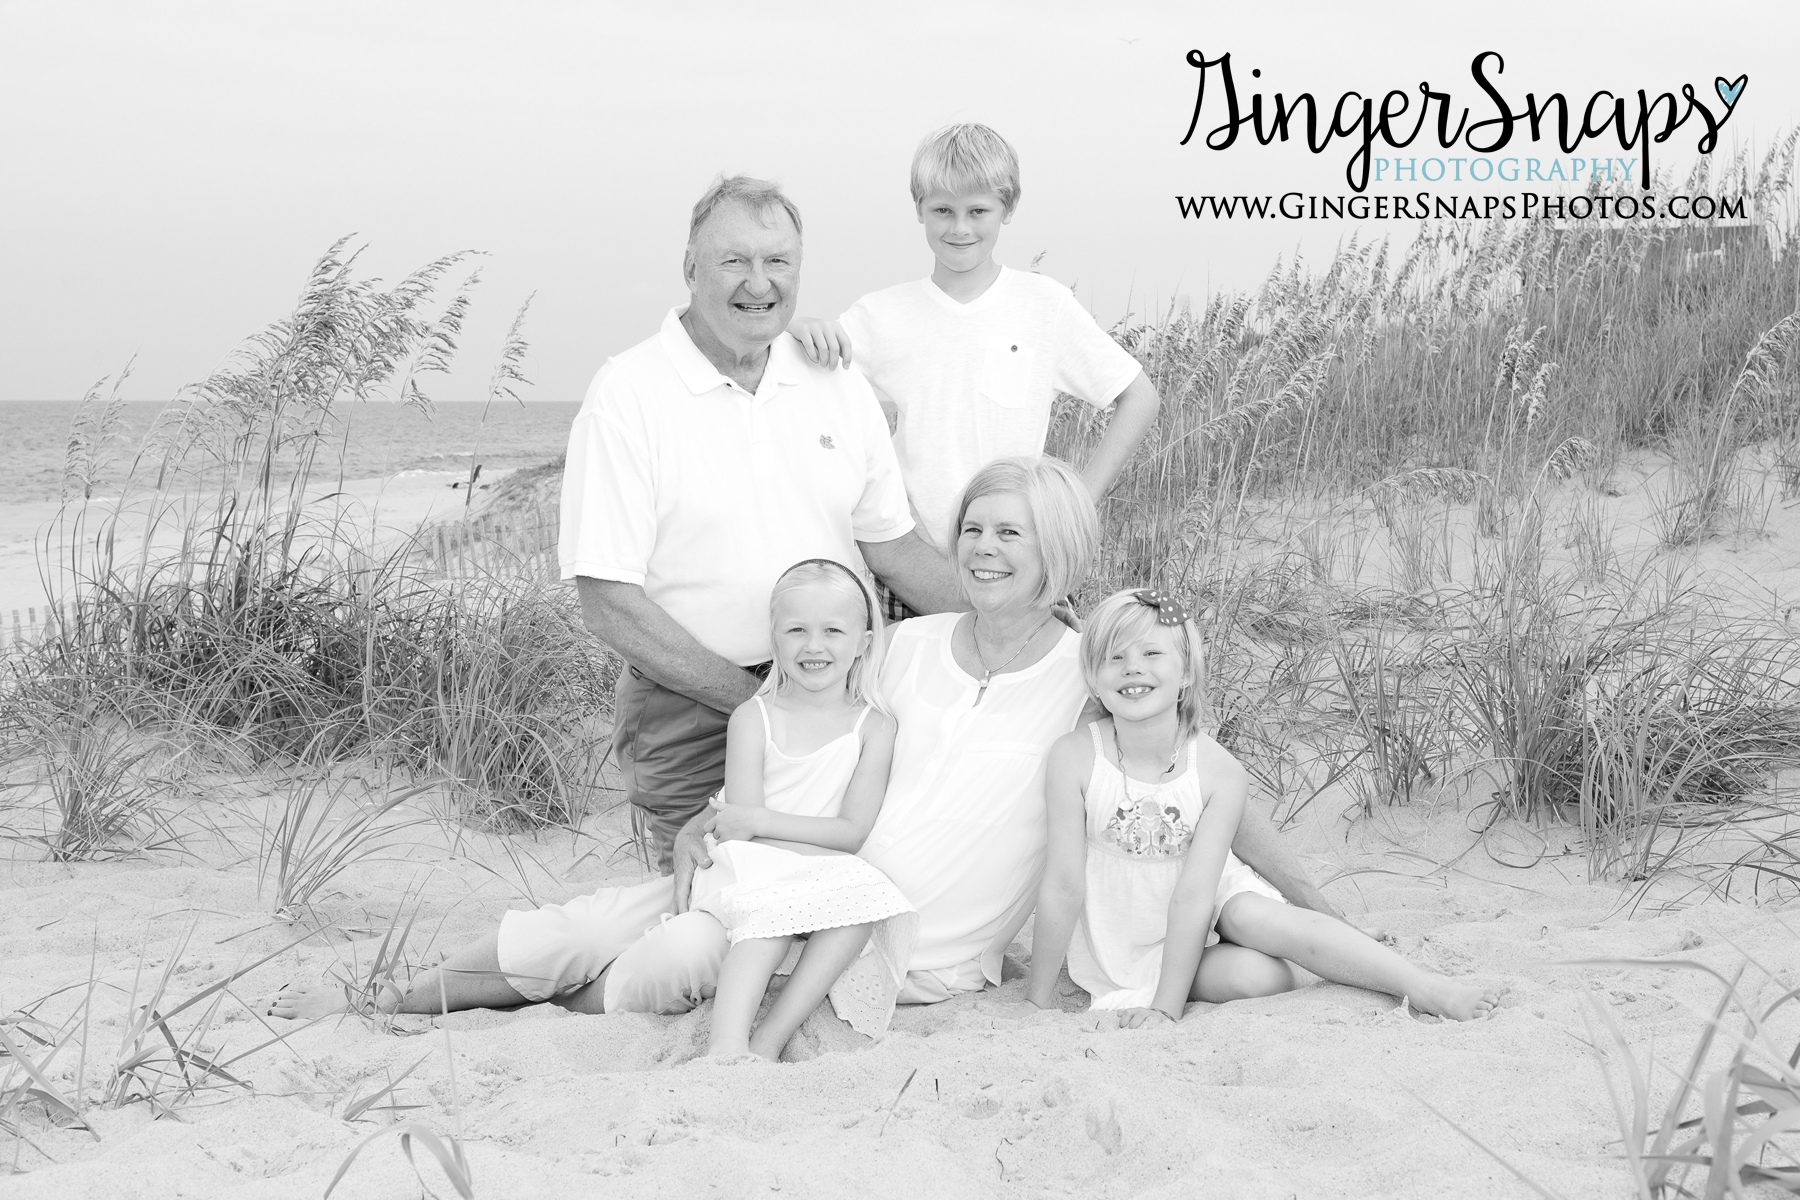 GingerSnaps Photography - 04.jpg